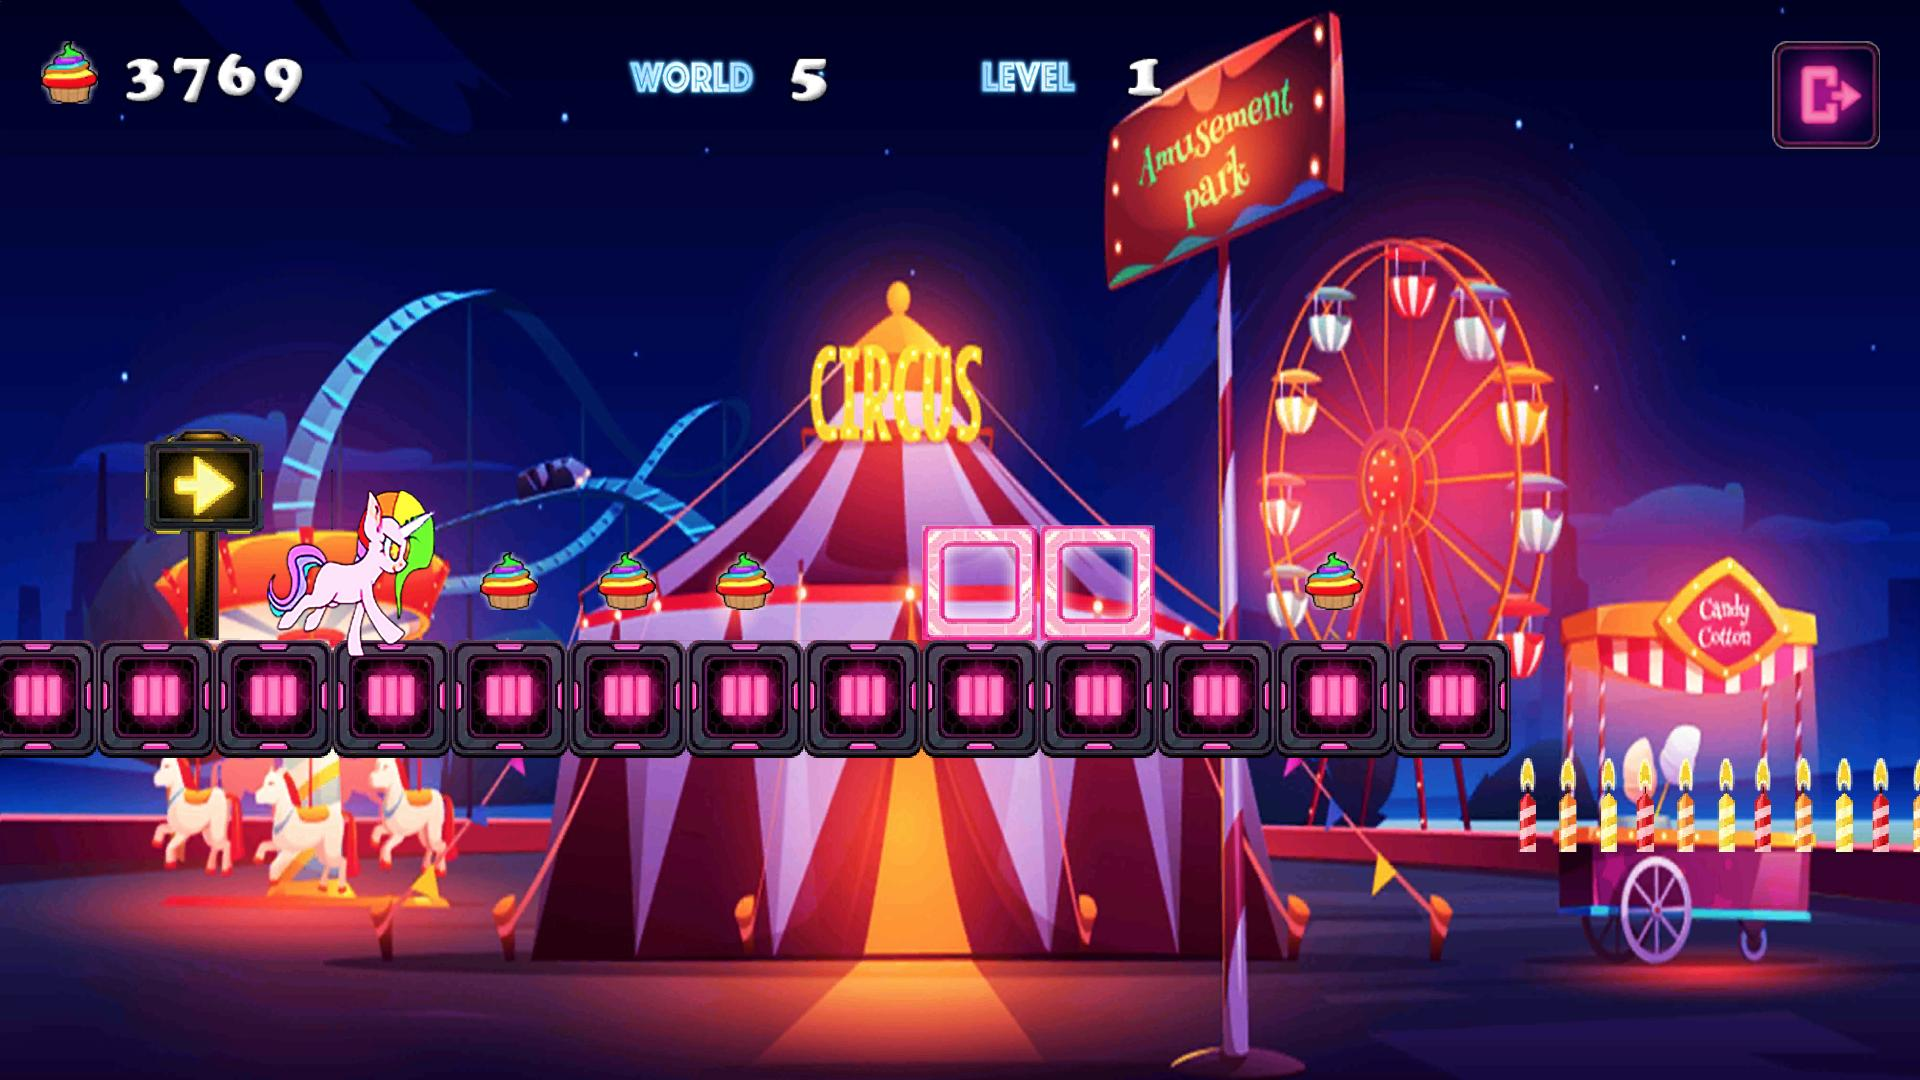 Unicorn Dash Neon Lights Unicorn Games mlp games 2.8.105 Screenshot 21